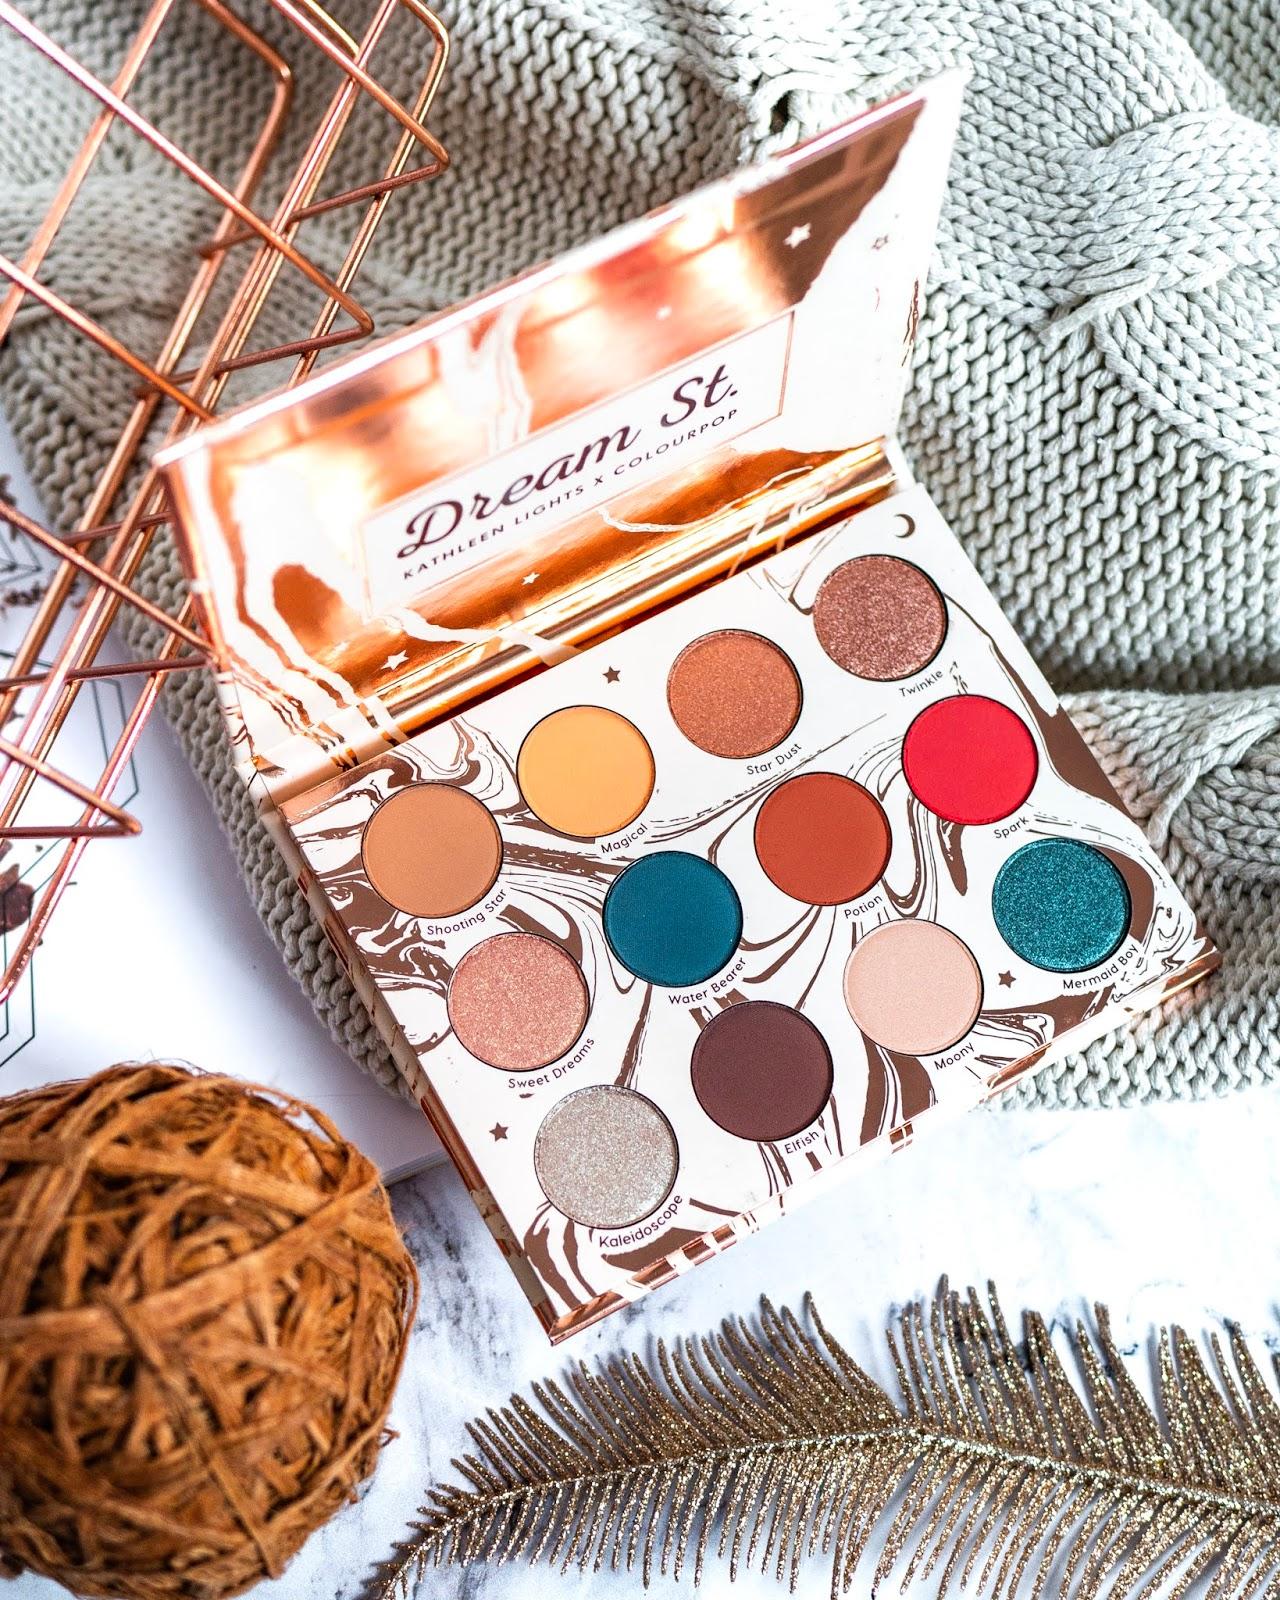 ColourPop Dream St. – recenzja, swatche, makijaże